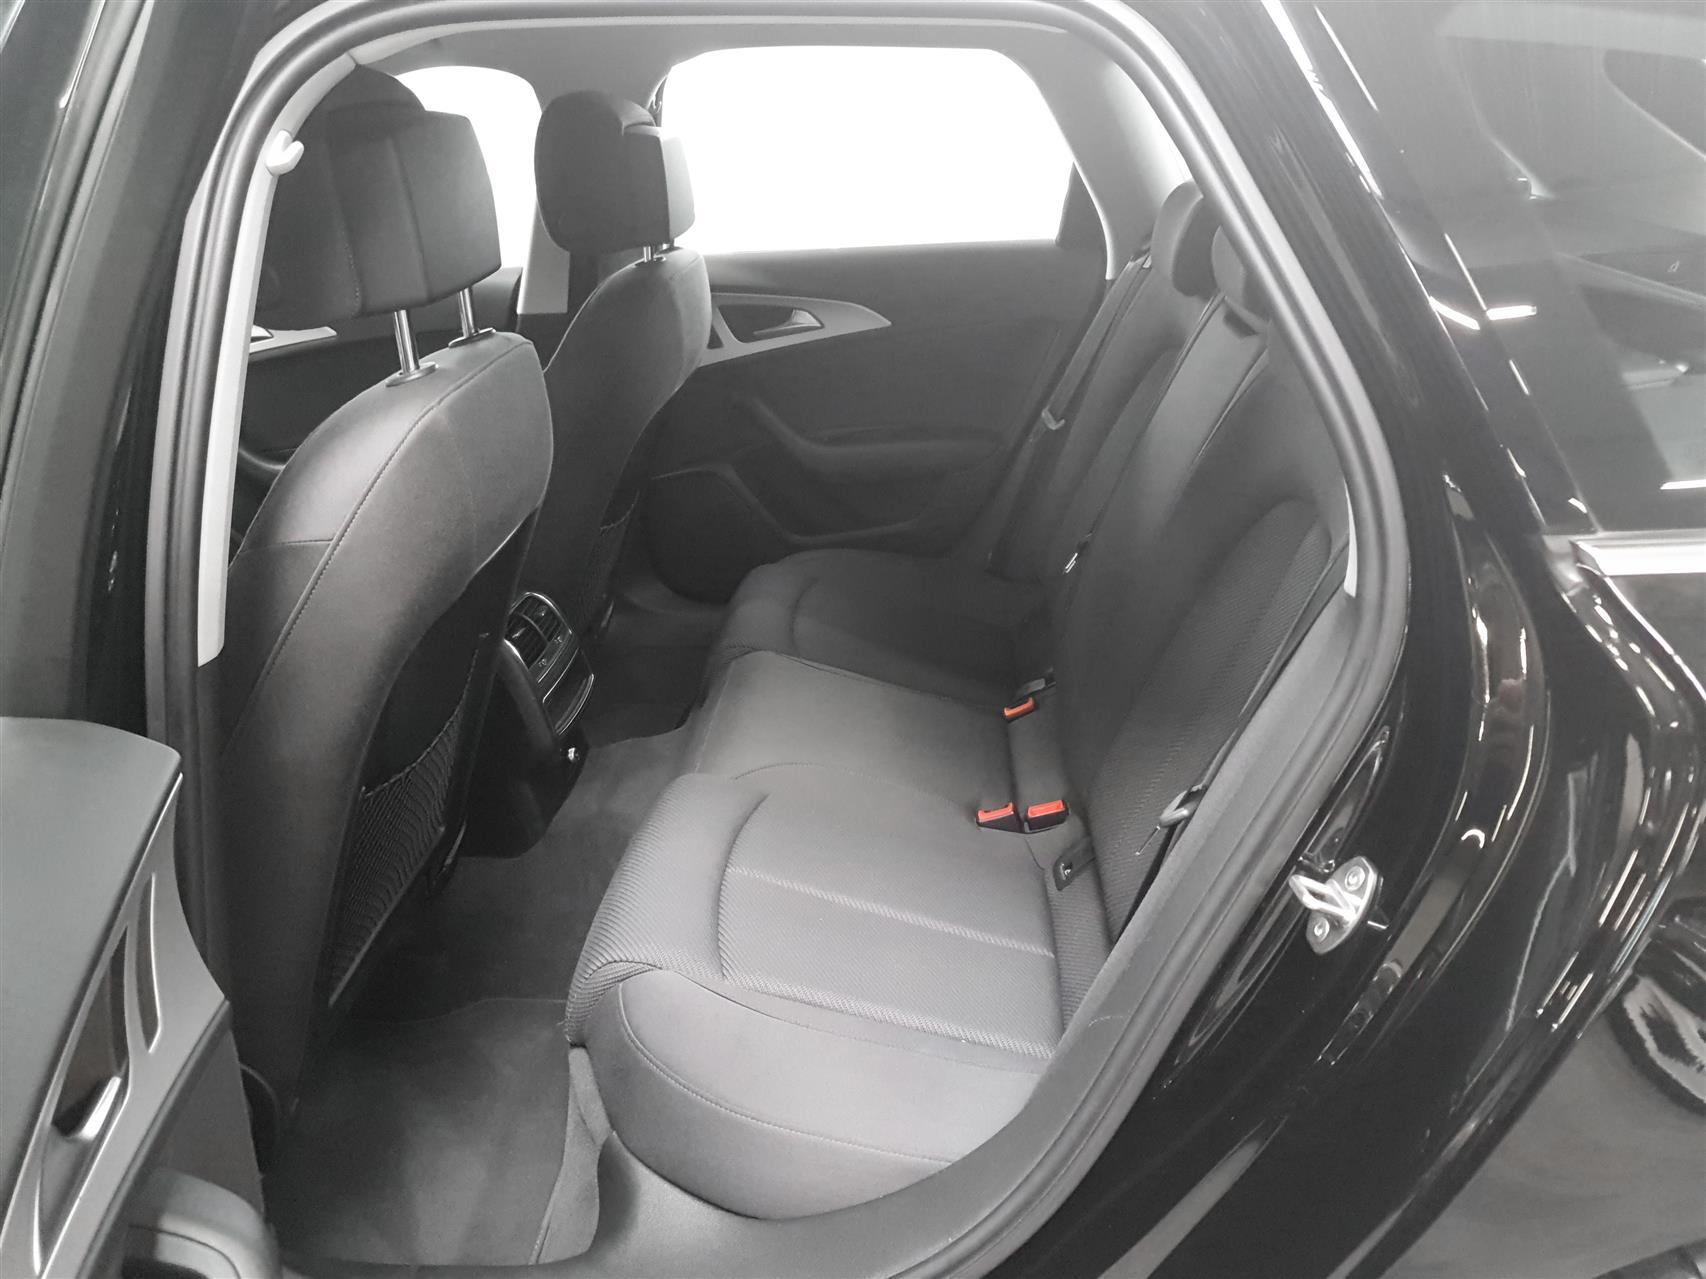 Avant 2,0 TDI Ultra S Tronic 190HK Stc 7g Aut. image4